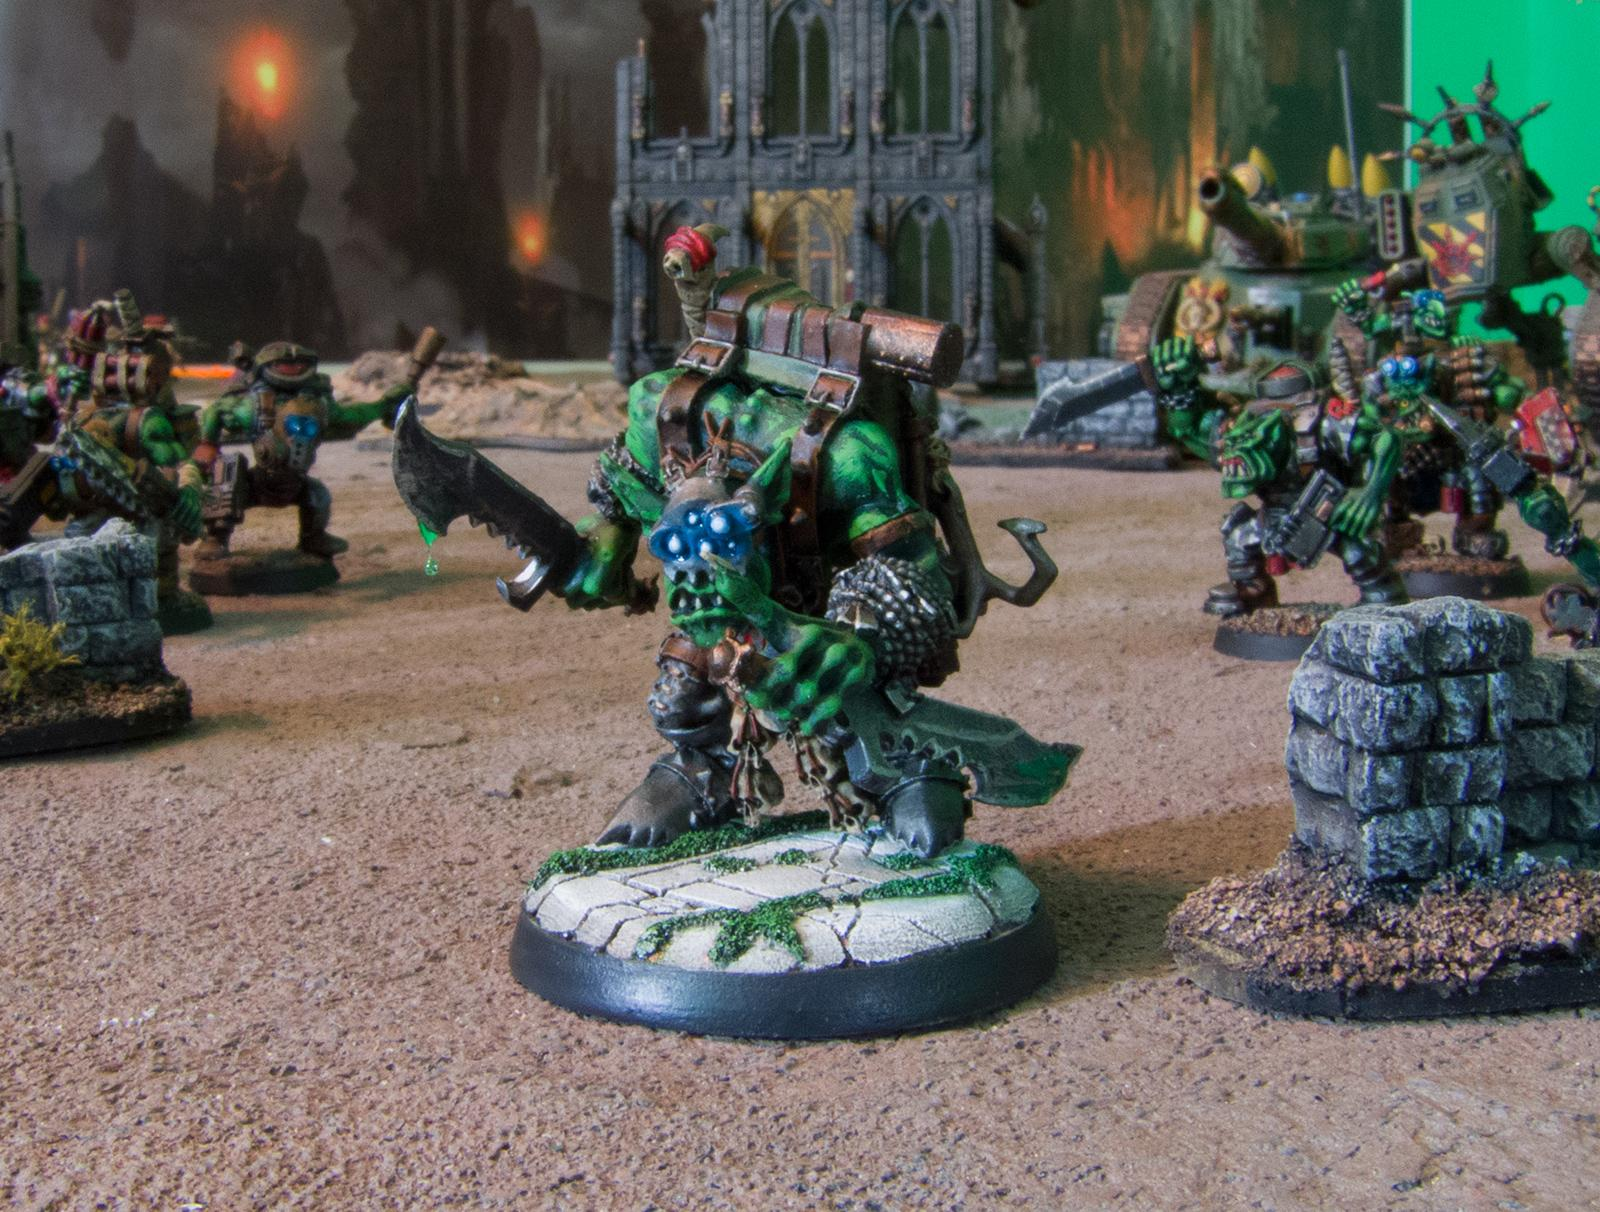 Blood Axe, Commando, Kommando, Nob, Orks, Ouze, Snikrot, Warhammer 40,000